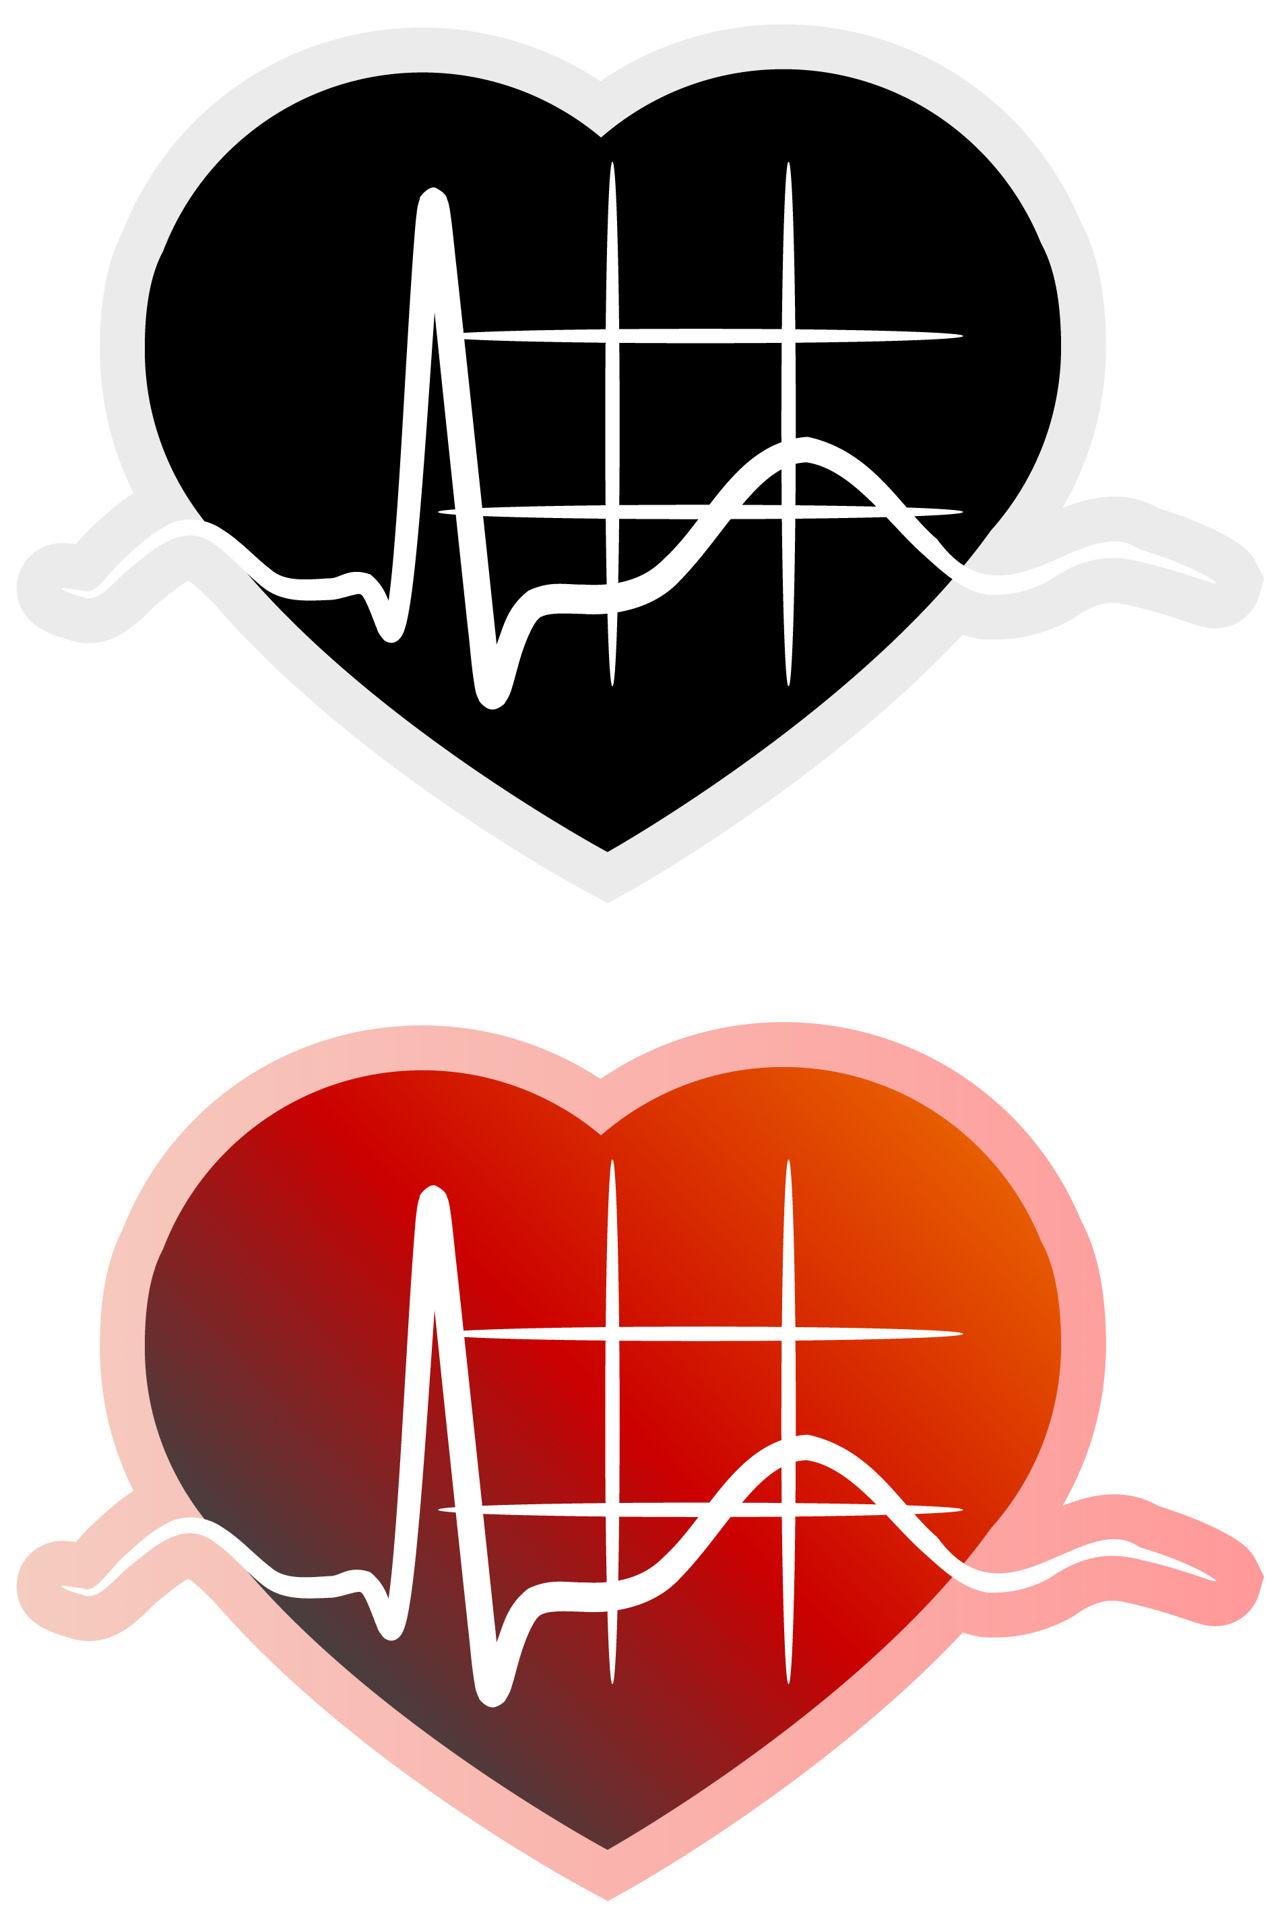 Normal Fetal Heart Rate Chart